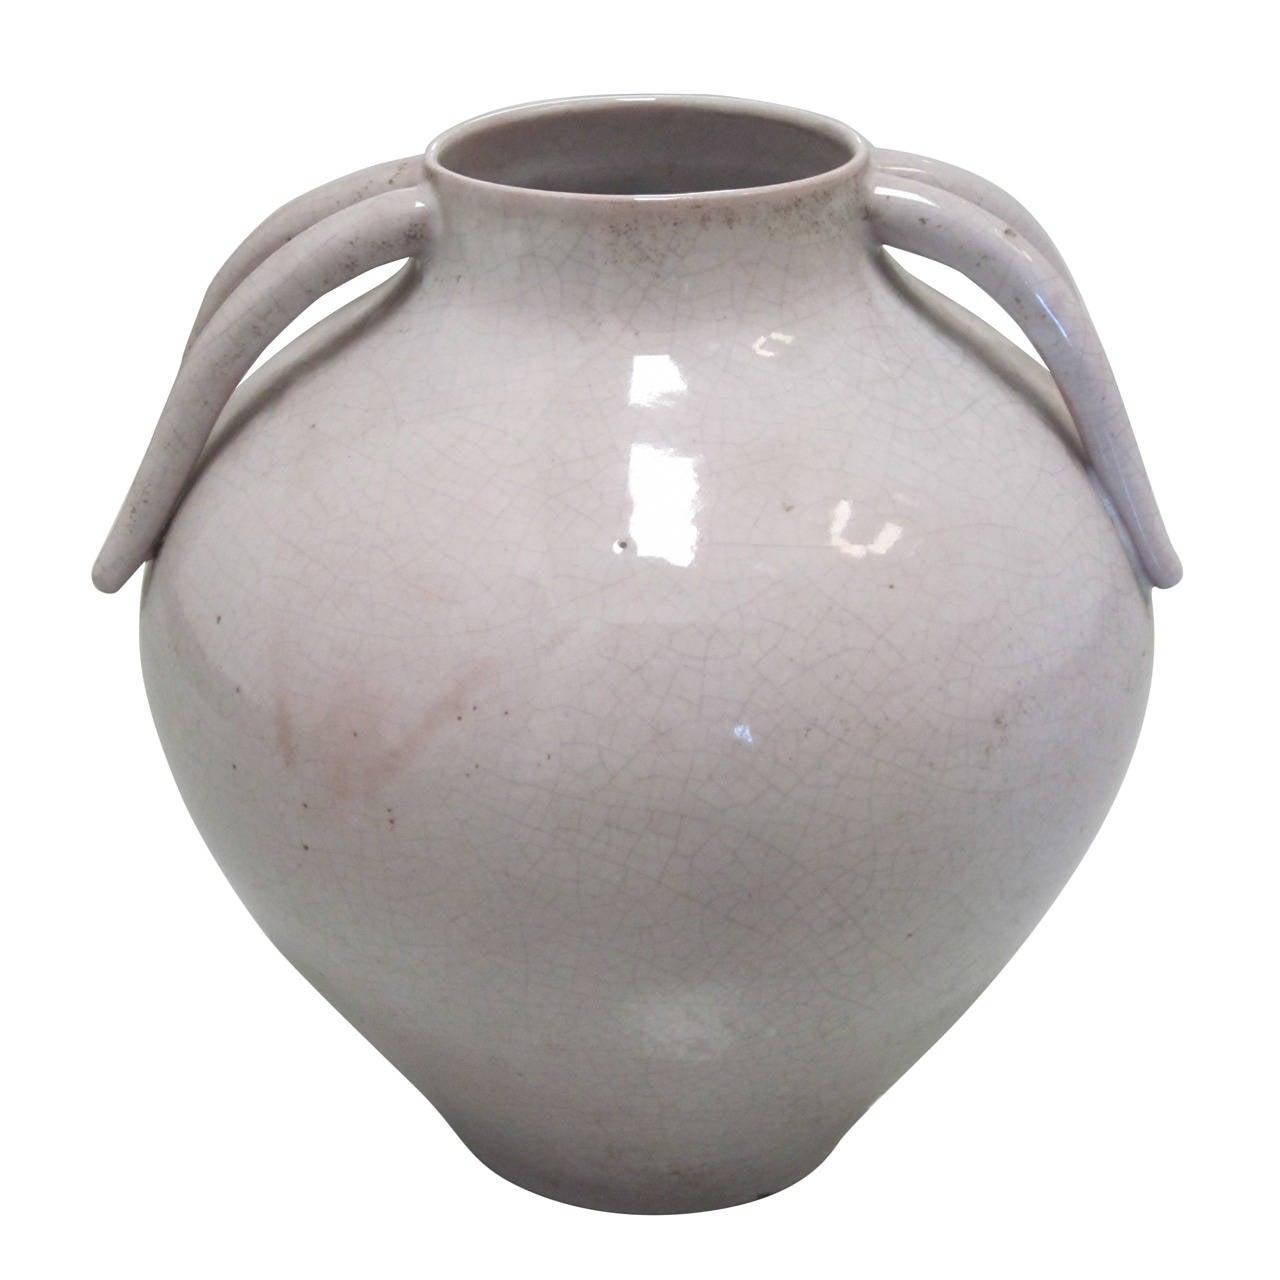 Italian Mid-Century Modern Stoneware Vase by Marcello Fantoni